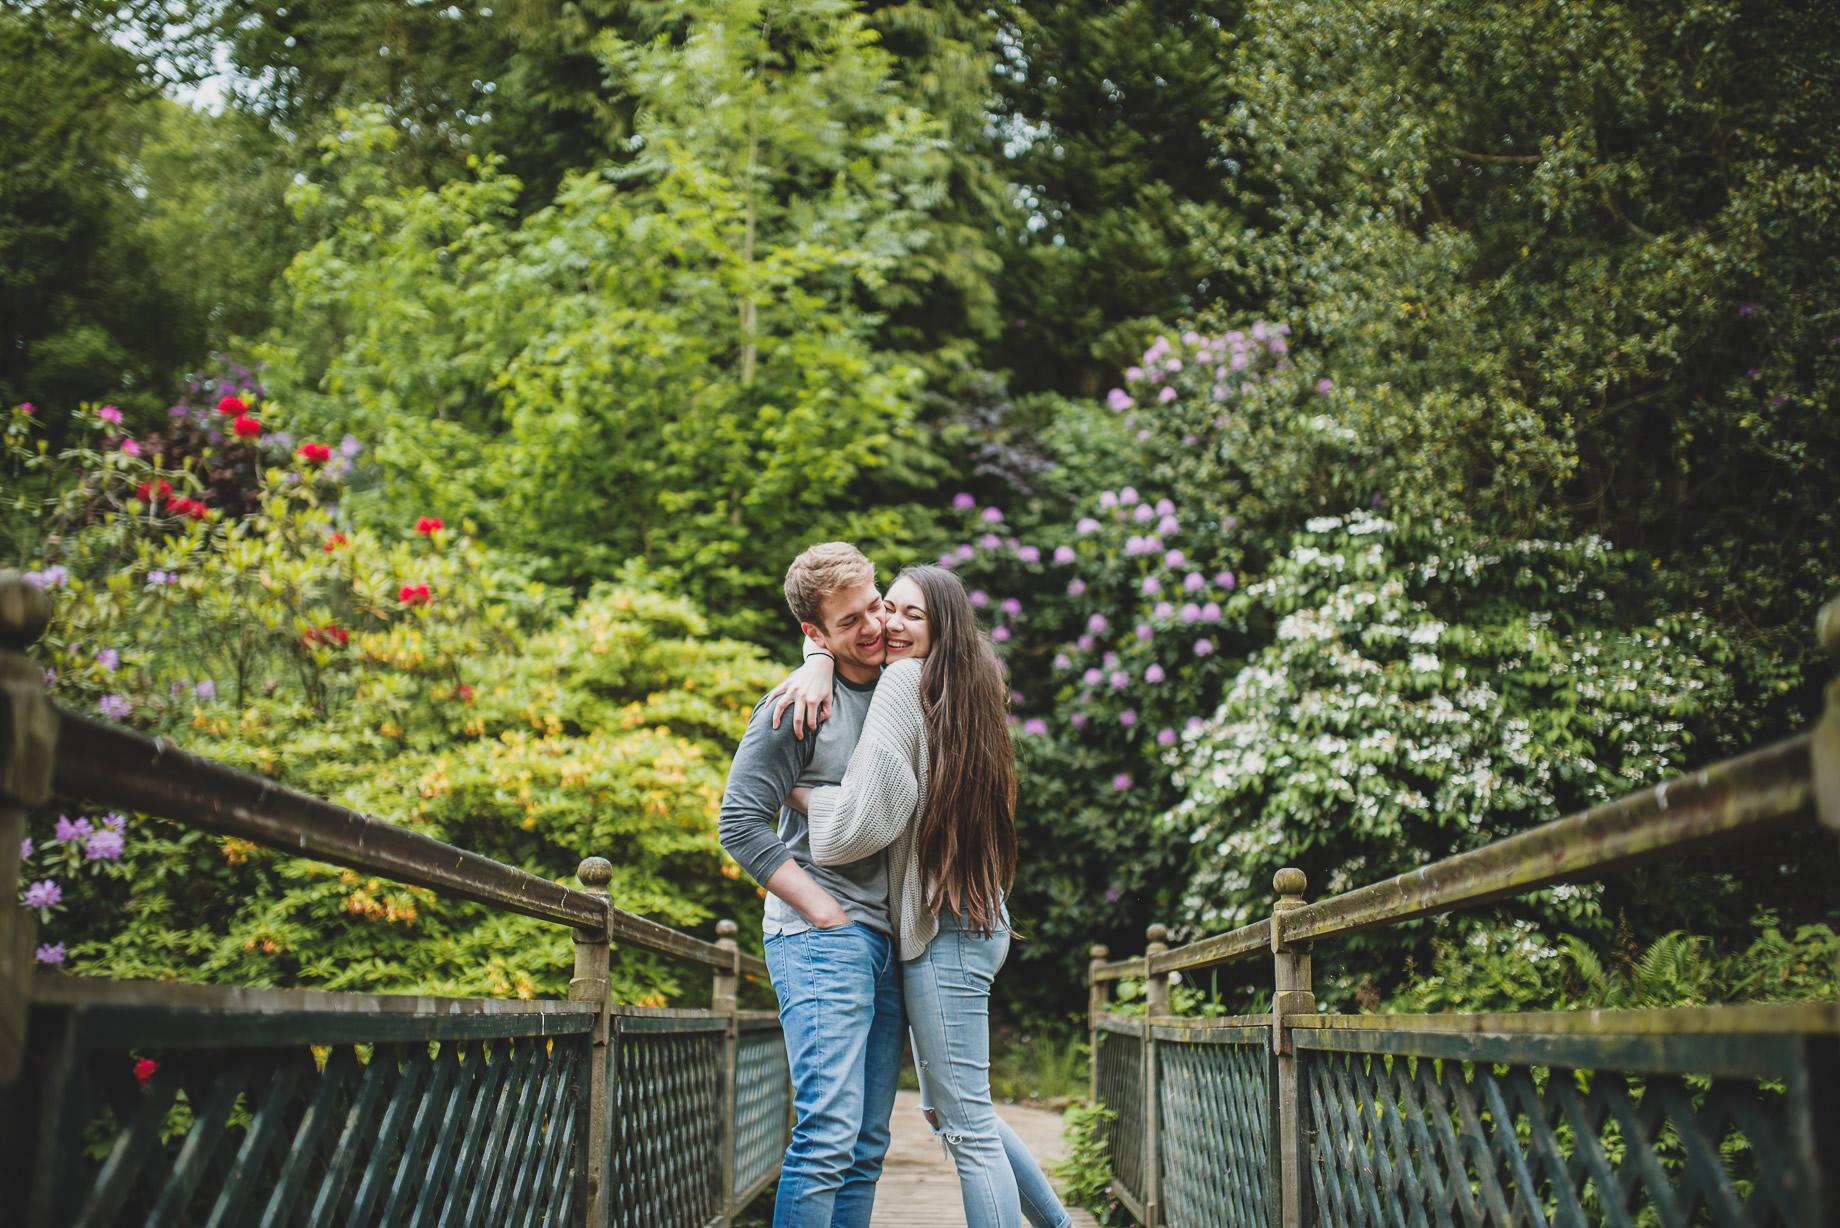 Becky and Emmett's Pre-Wedding Shoot in Scorton 031